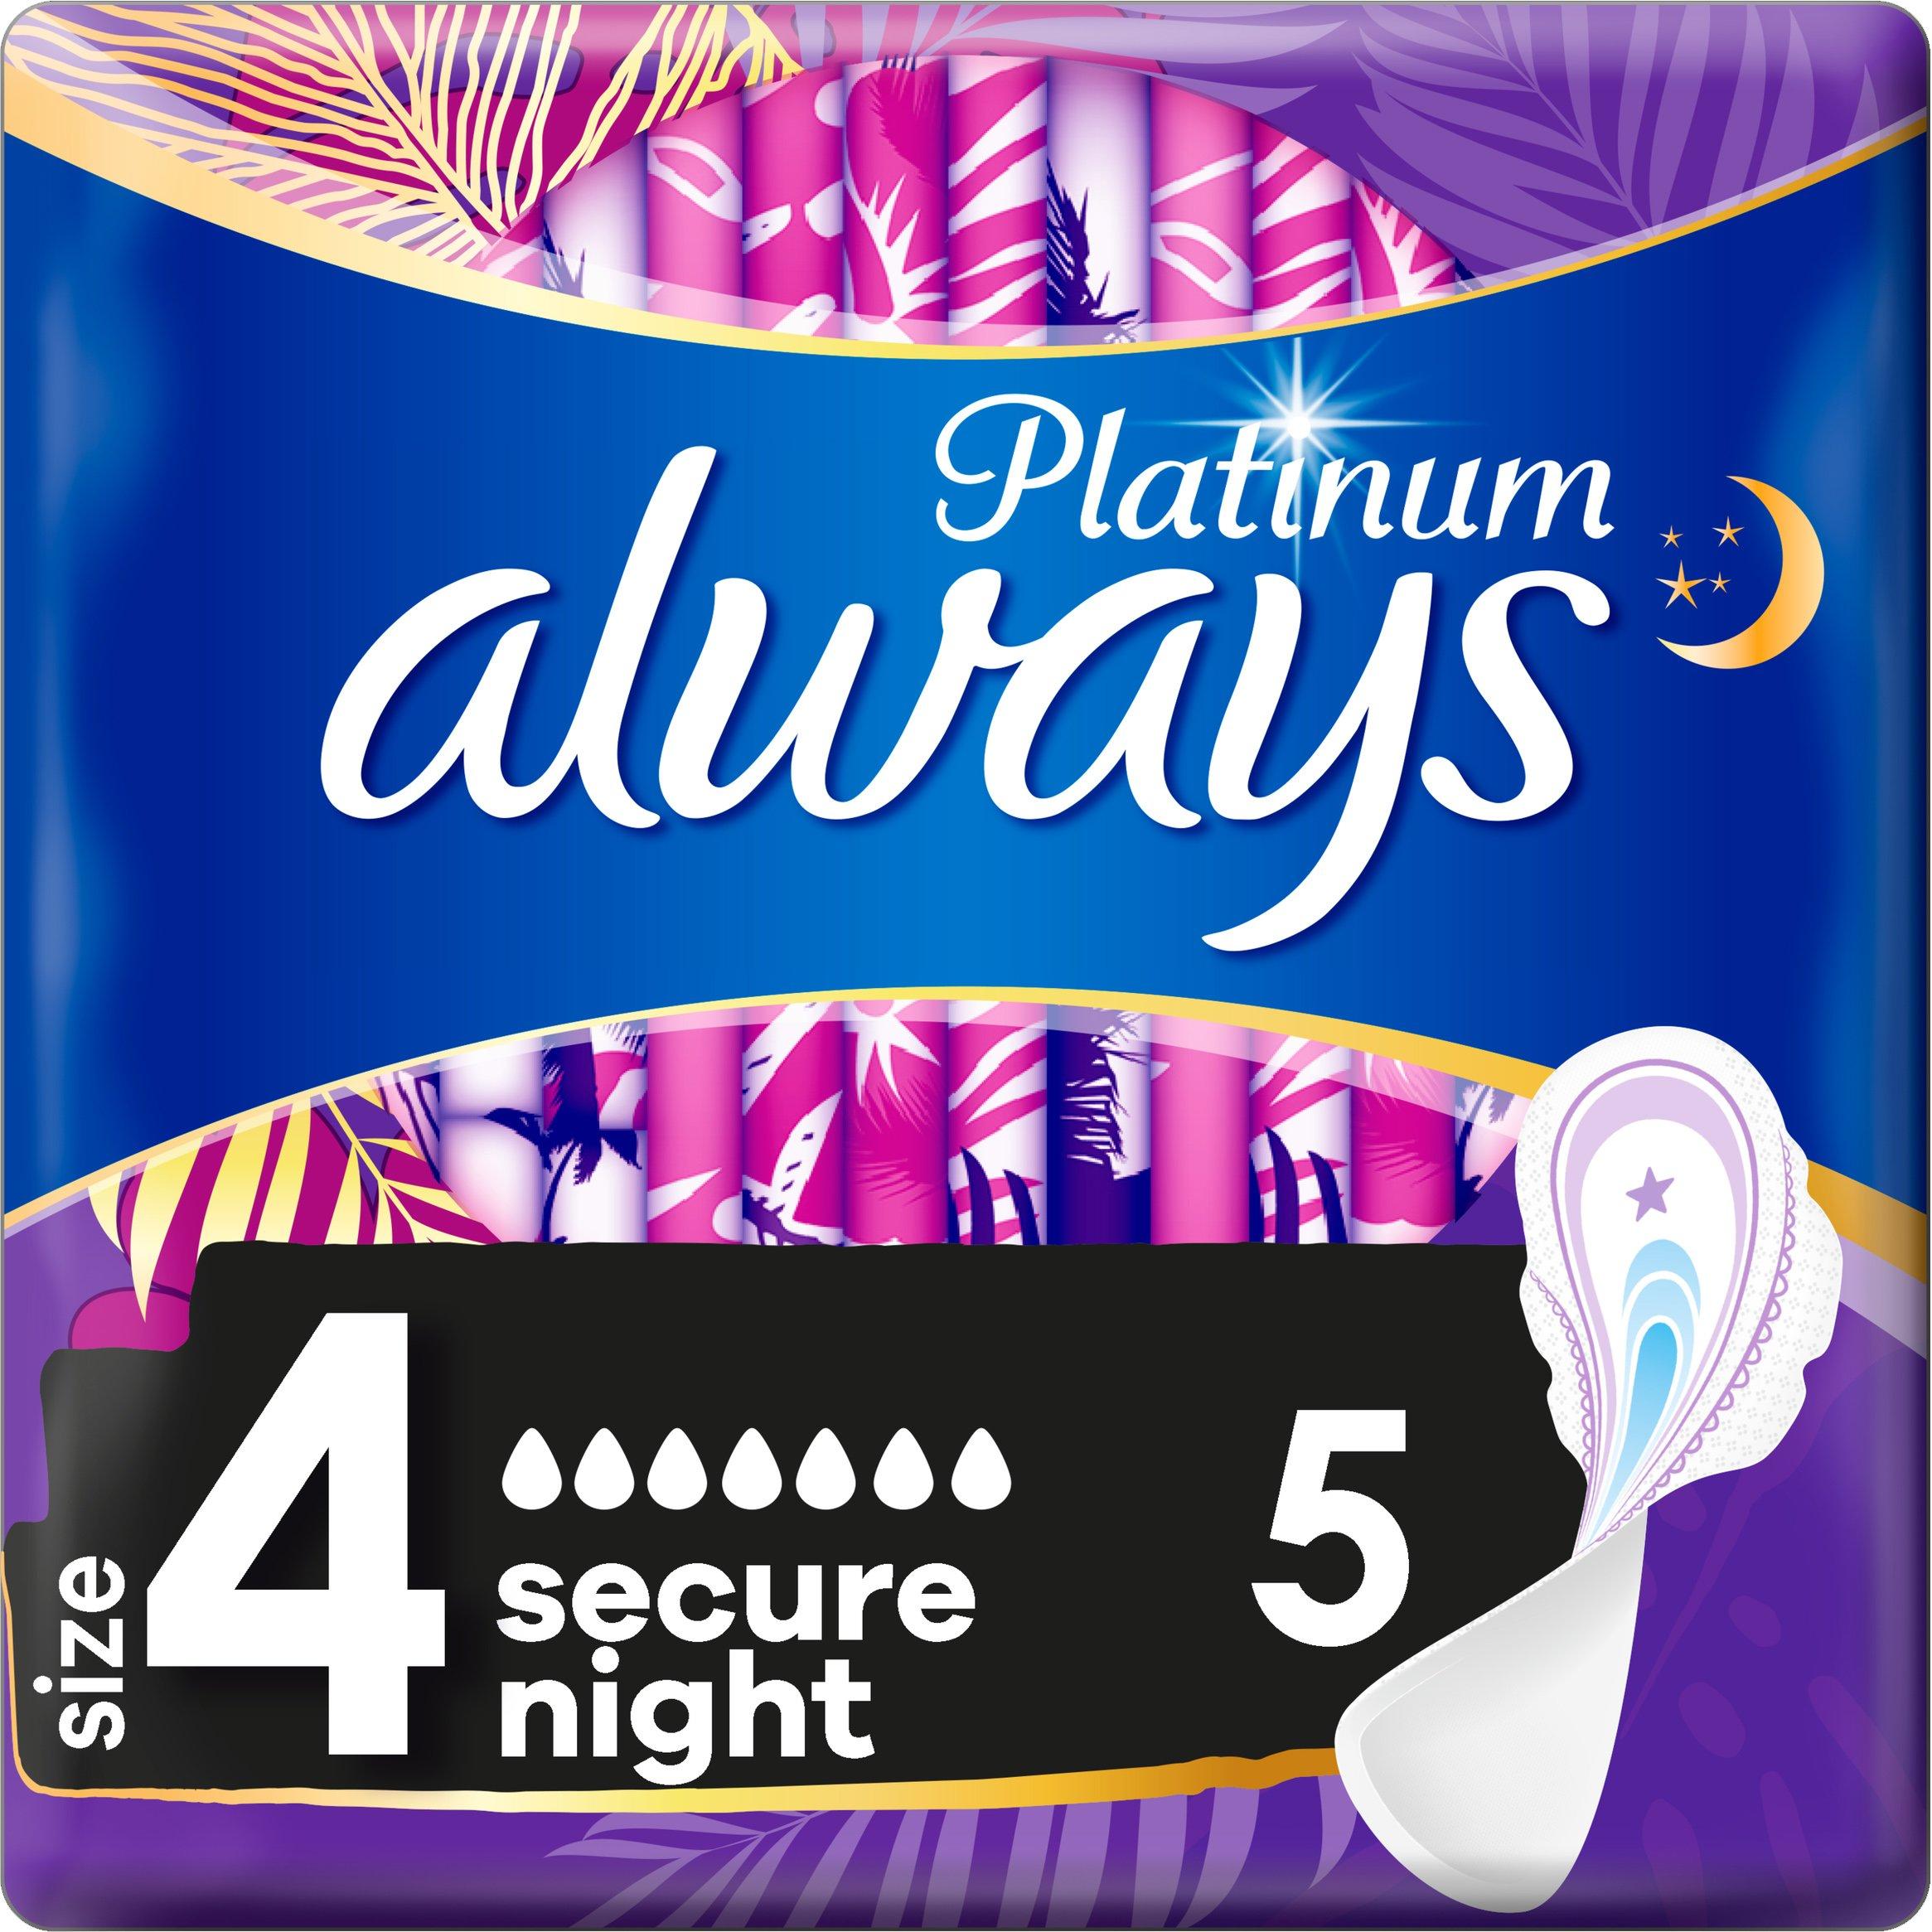 Always Platinum Σερβιέτες Μέγεθος 4 Ultra Secure Night 5 Pads